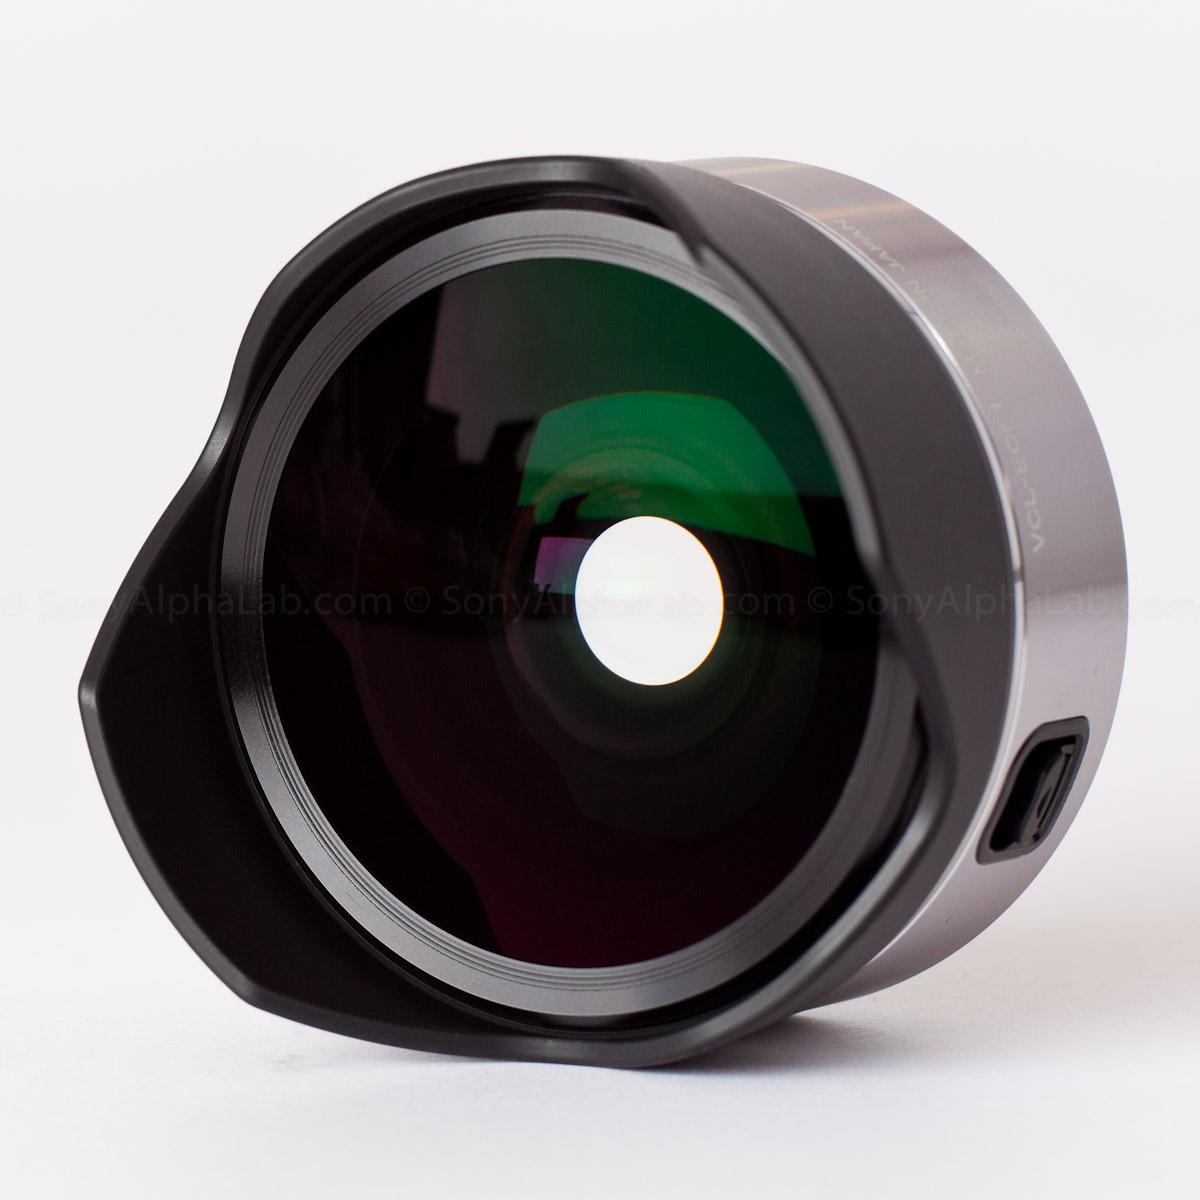 Fisheye Conversion Lens for the 16mm E-Mount Lens